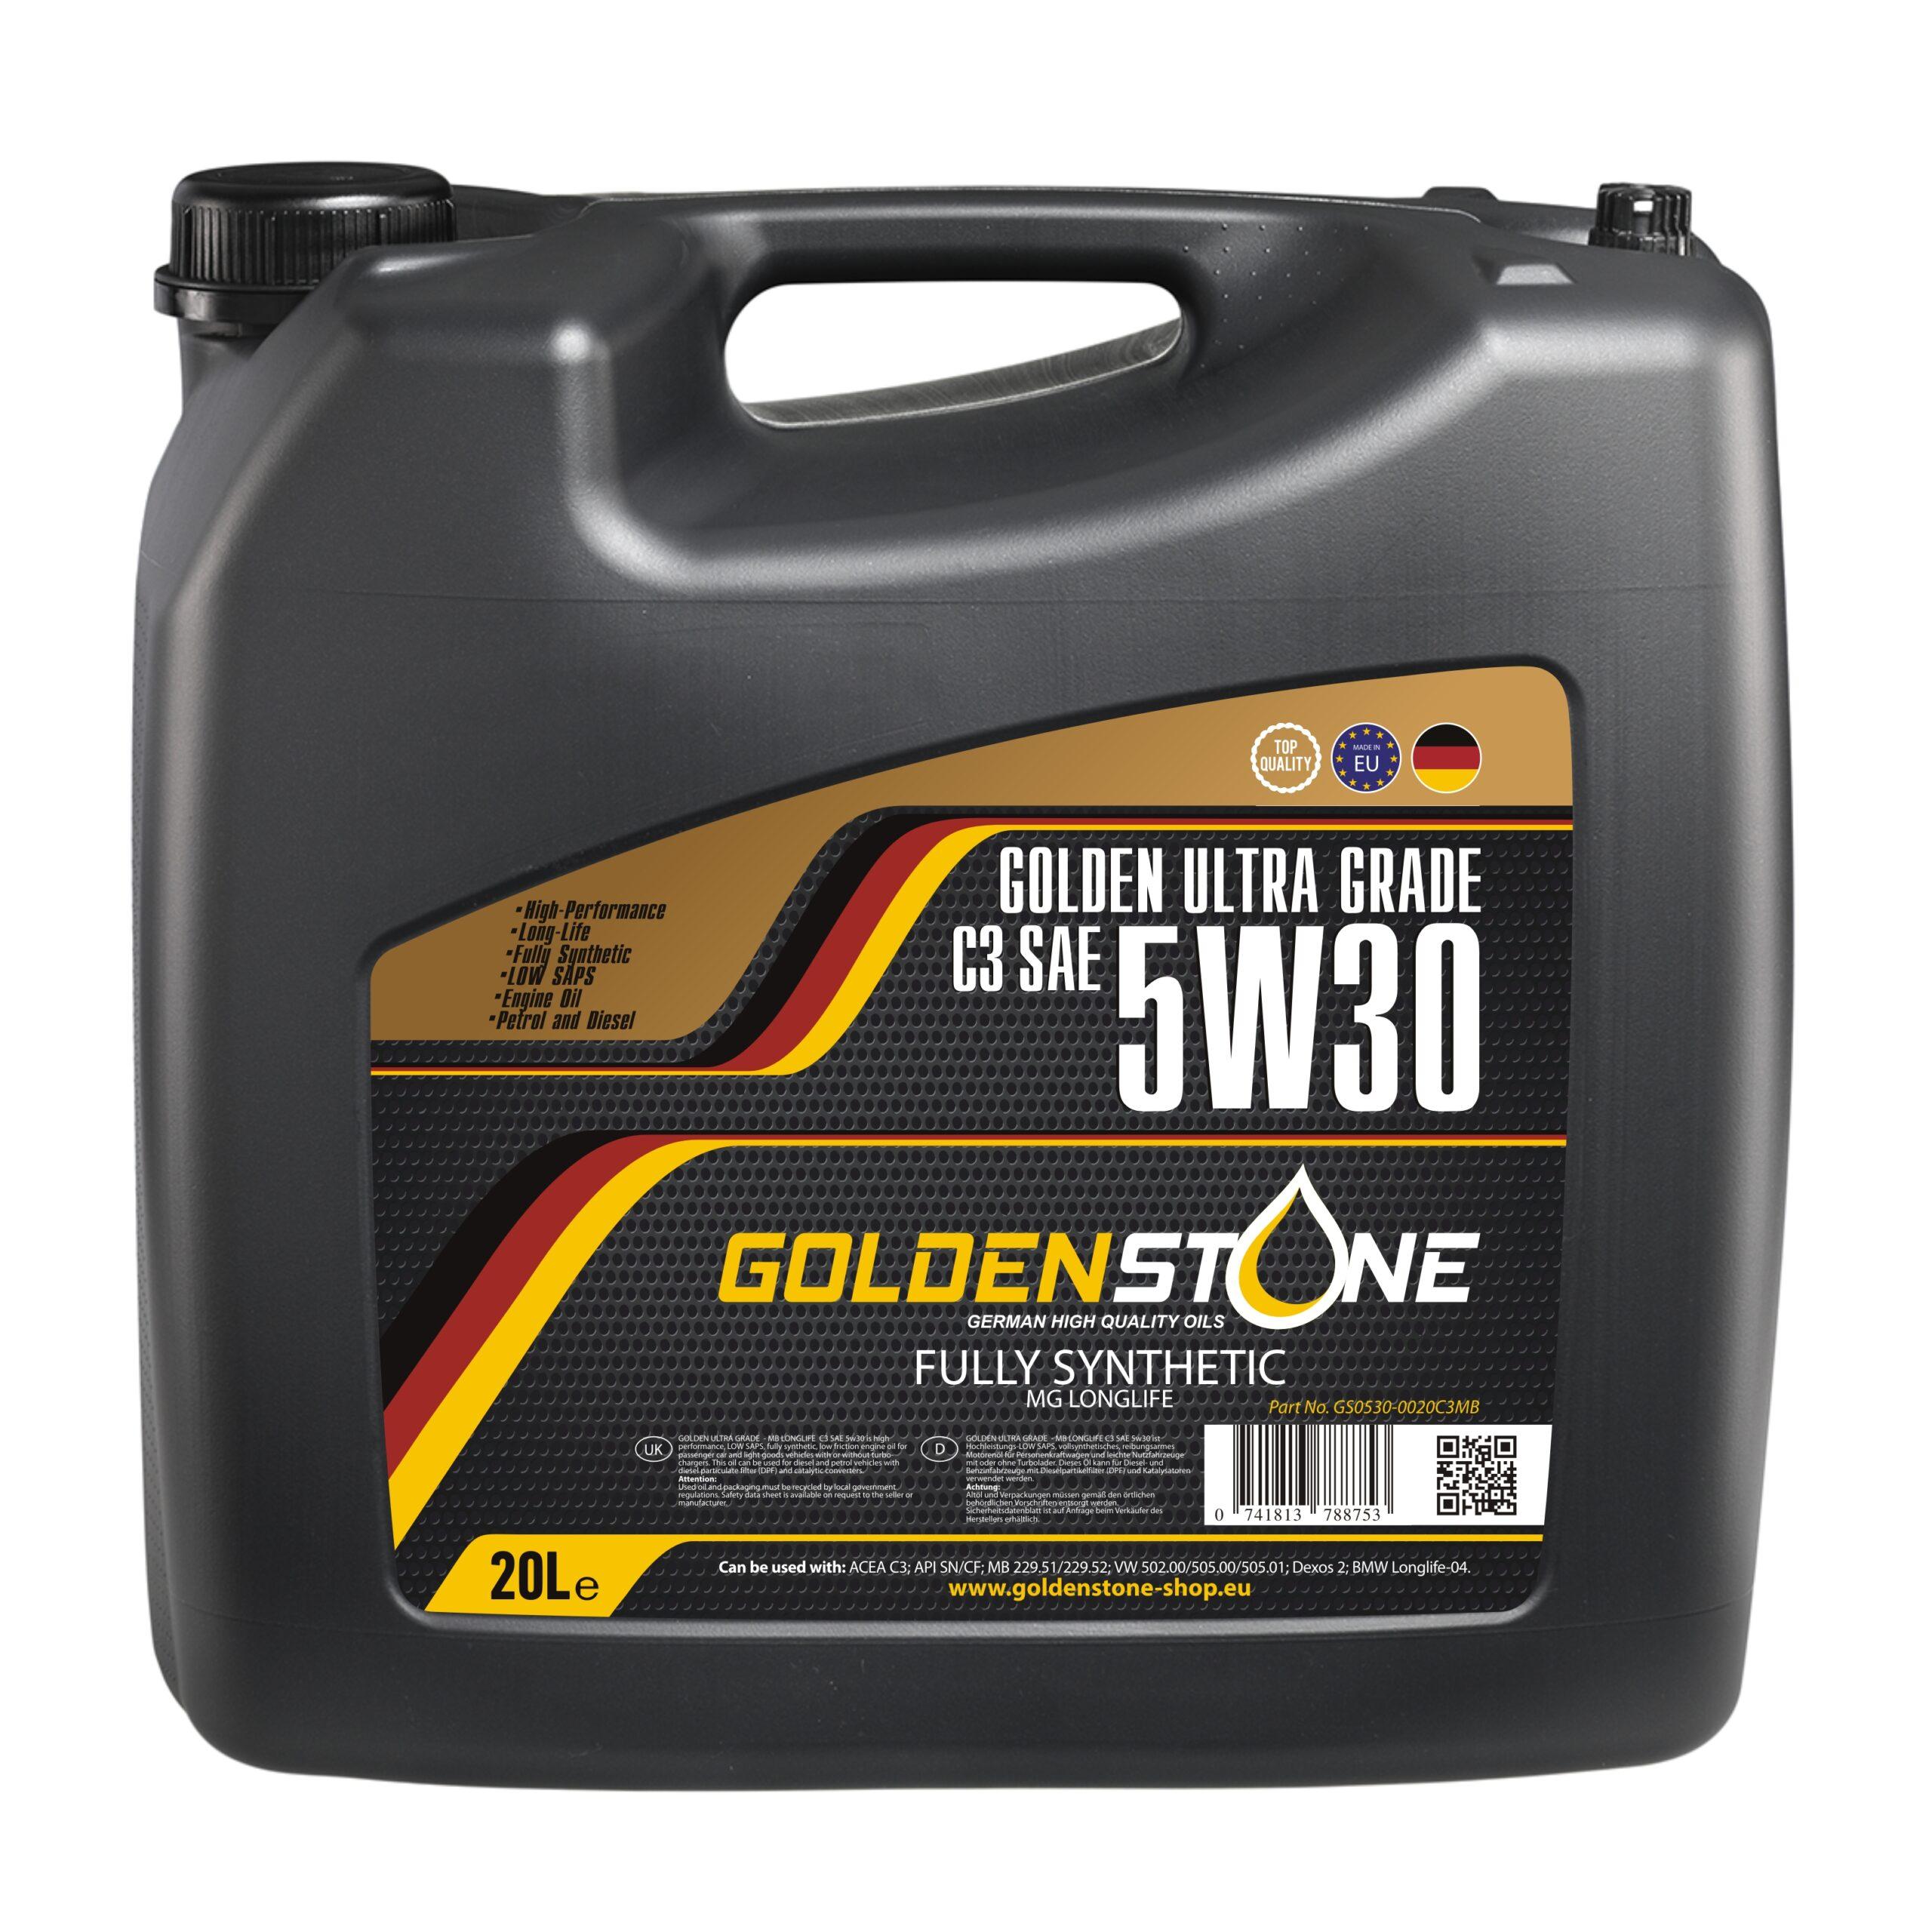 Goldenstone Motorolie 5W30 C3 LONGLIFE 20liter